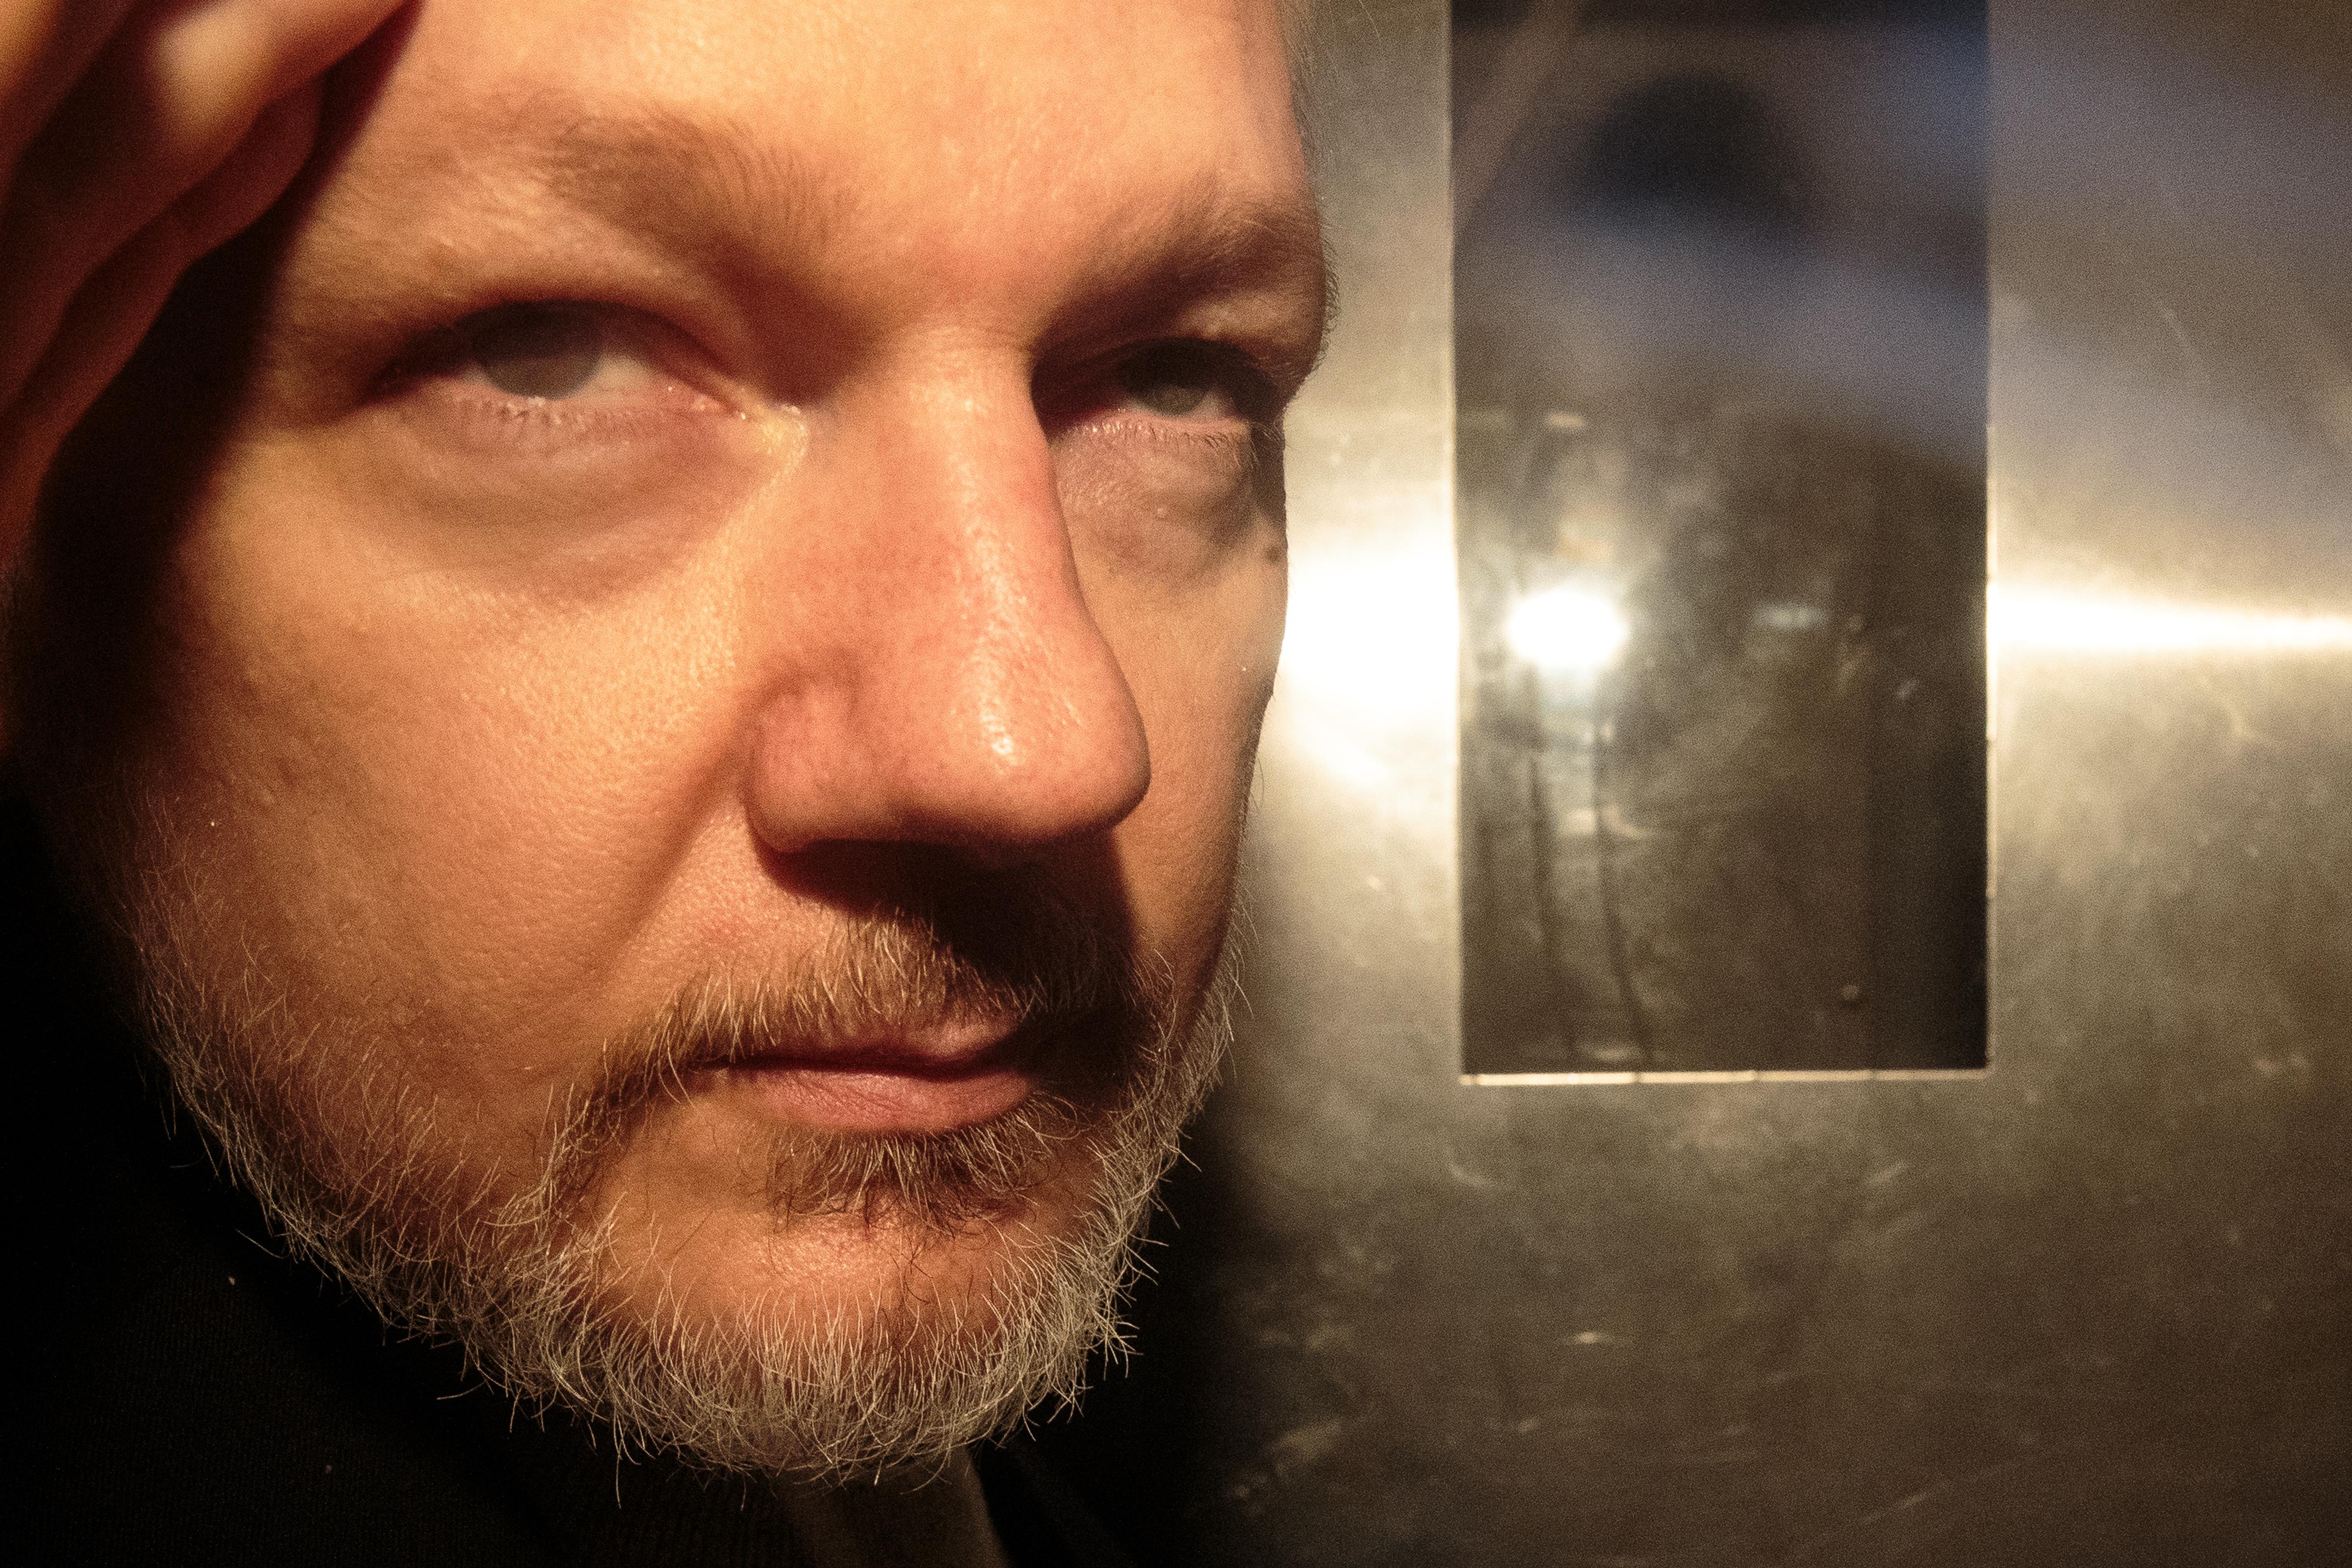 separation shoes c3713 6380b Julian Assange is facing 17 new criminal charges